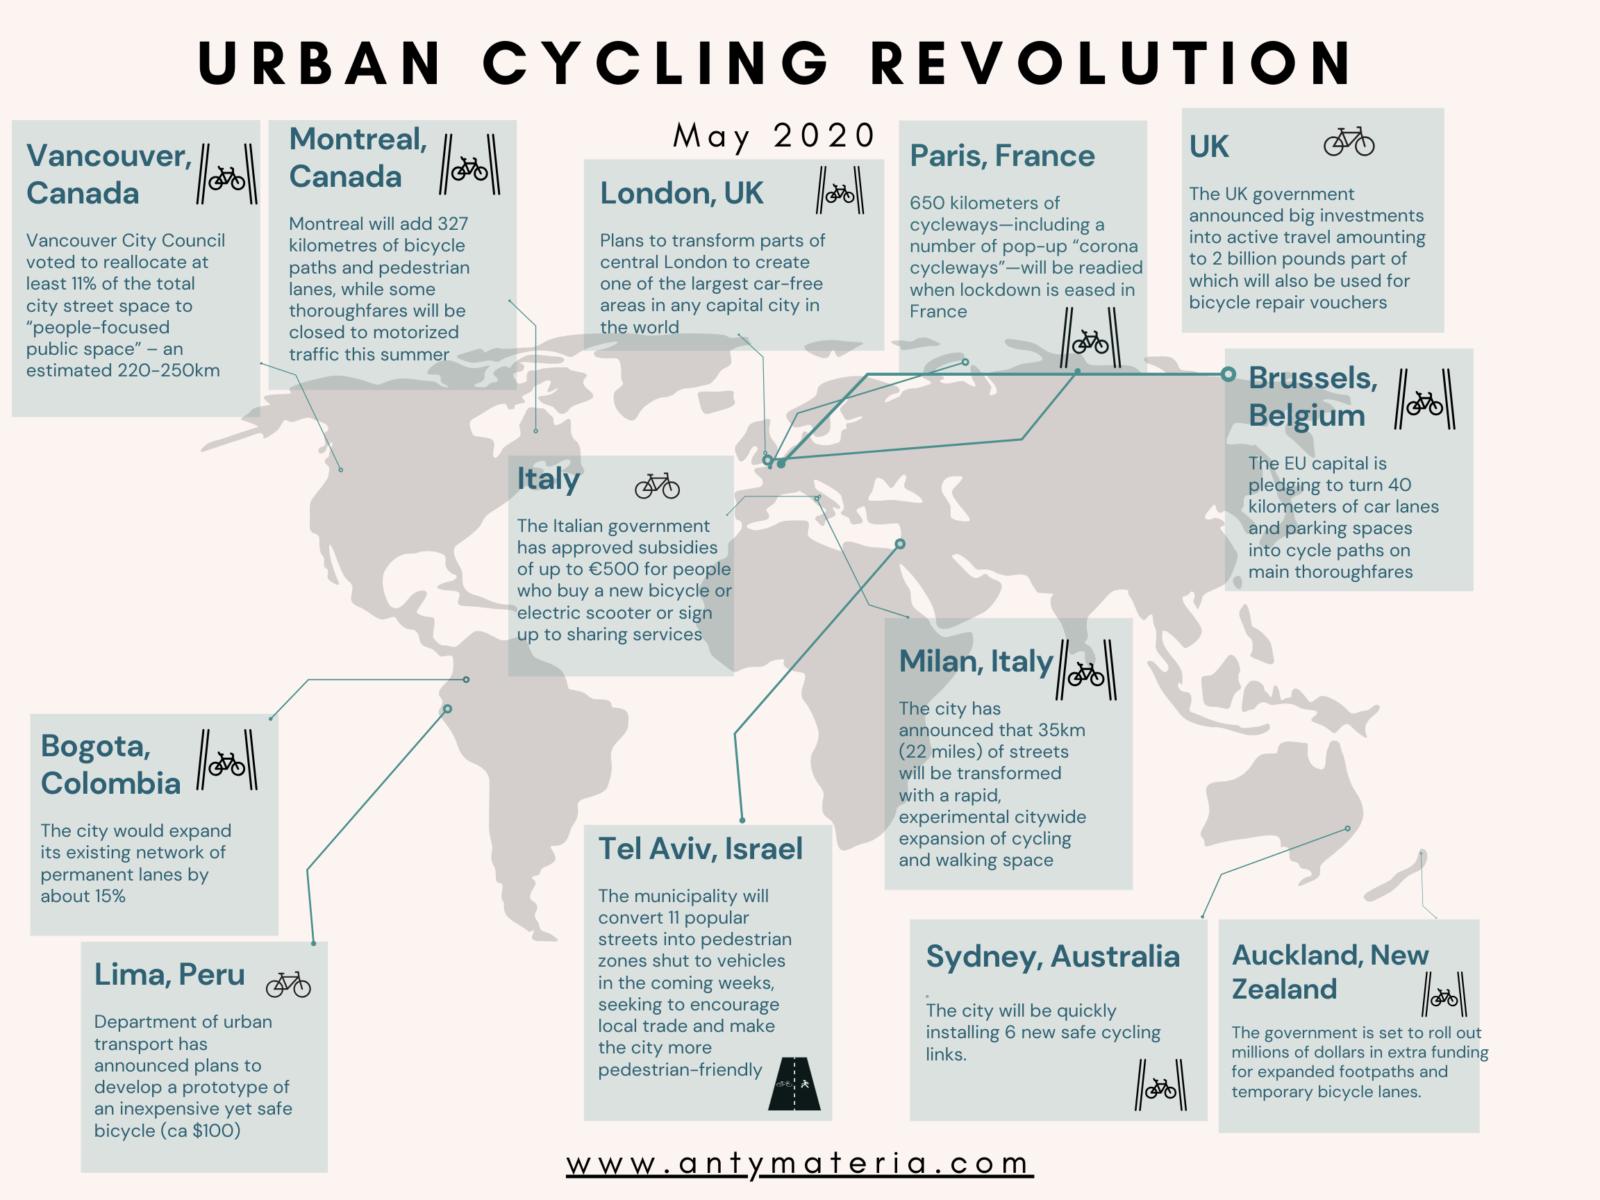 Urban Cycling Revolution 2020